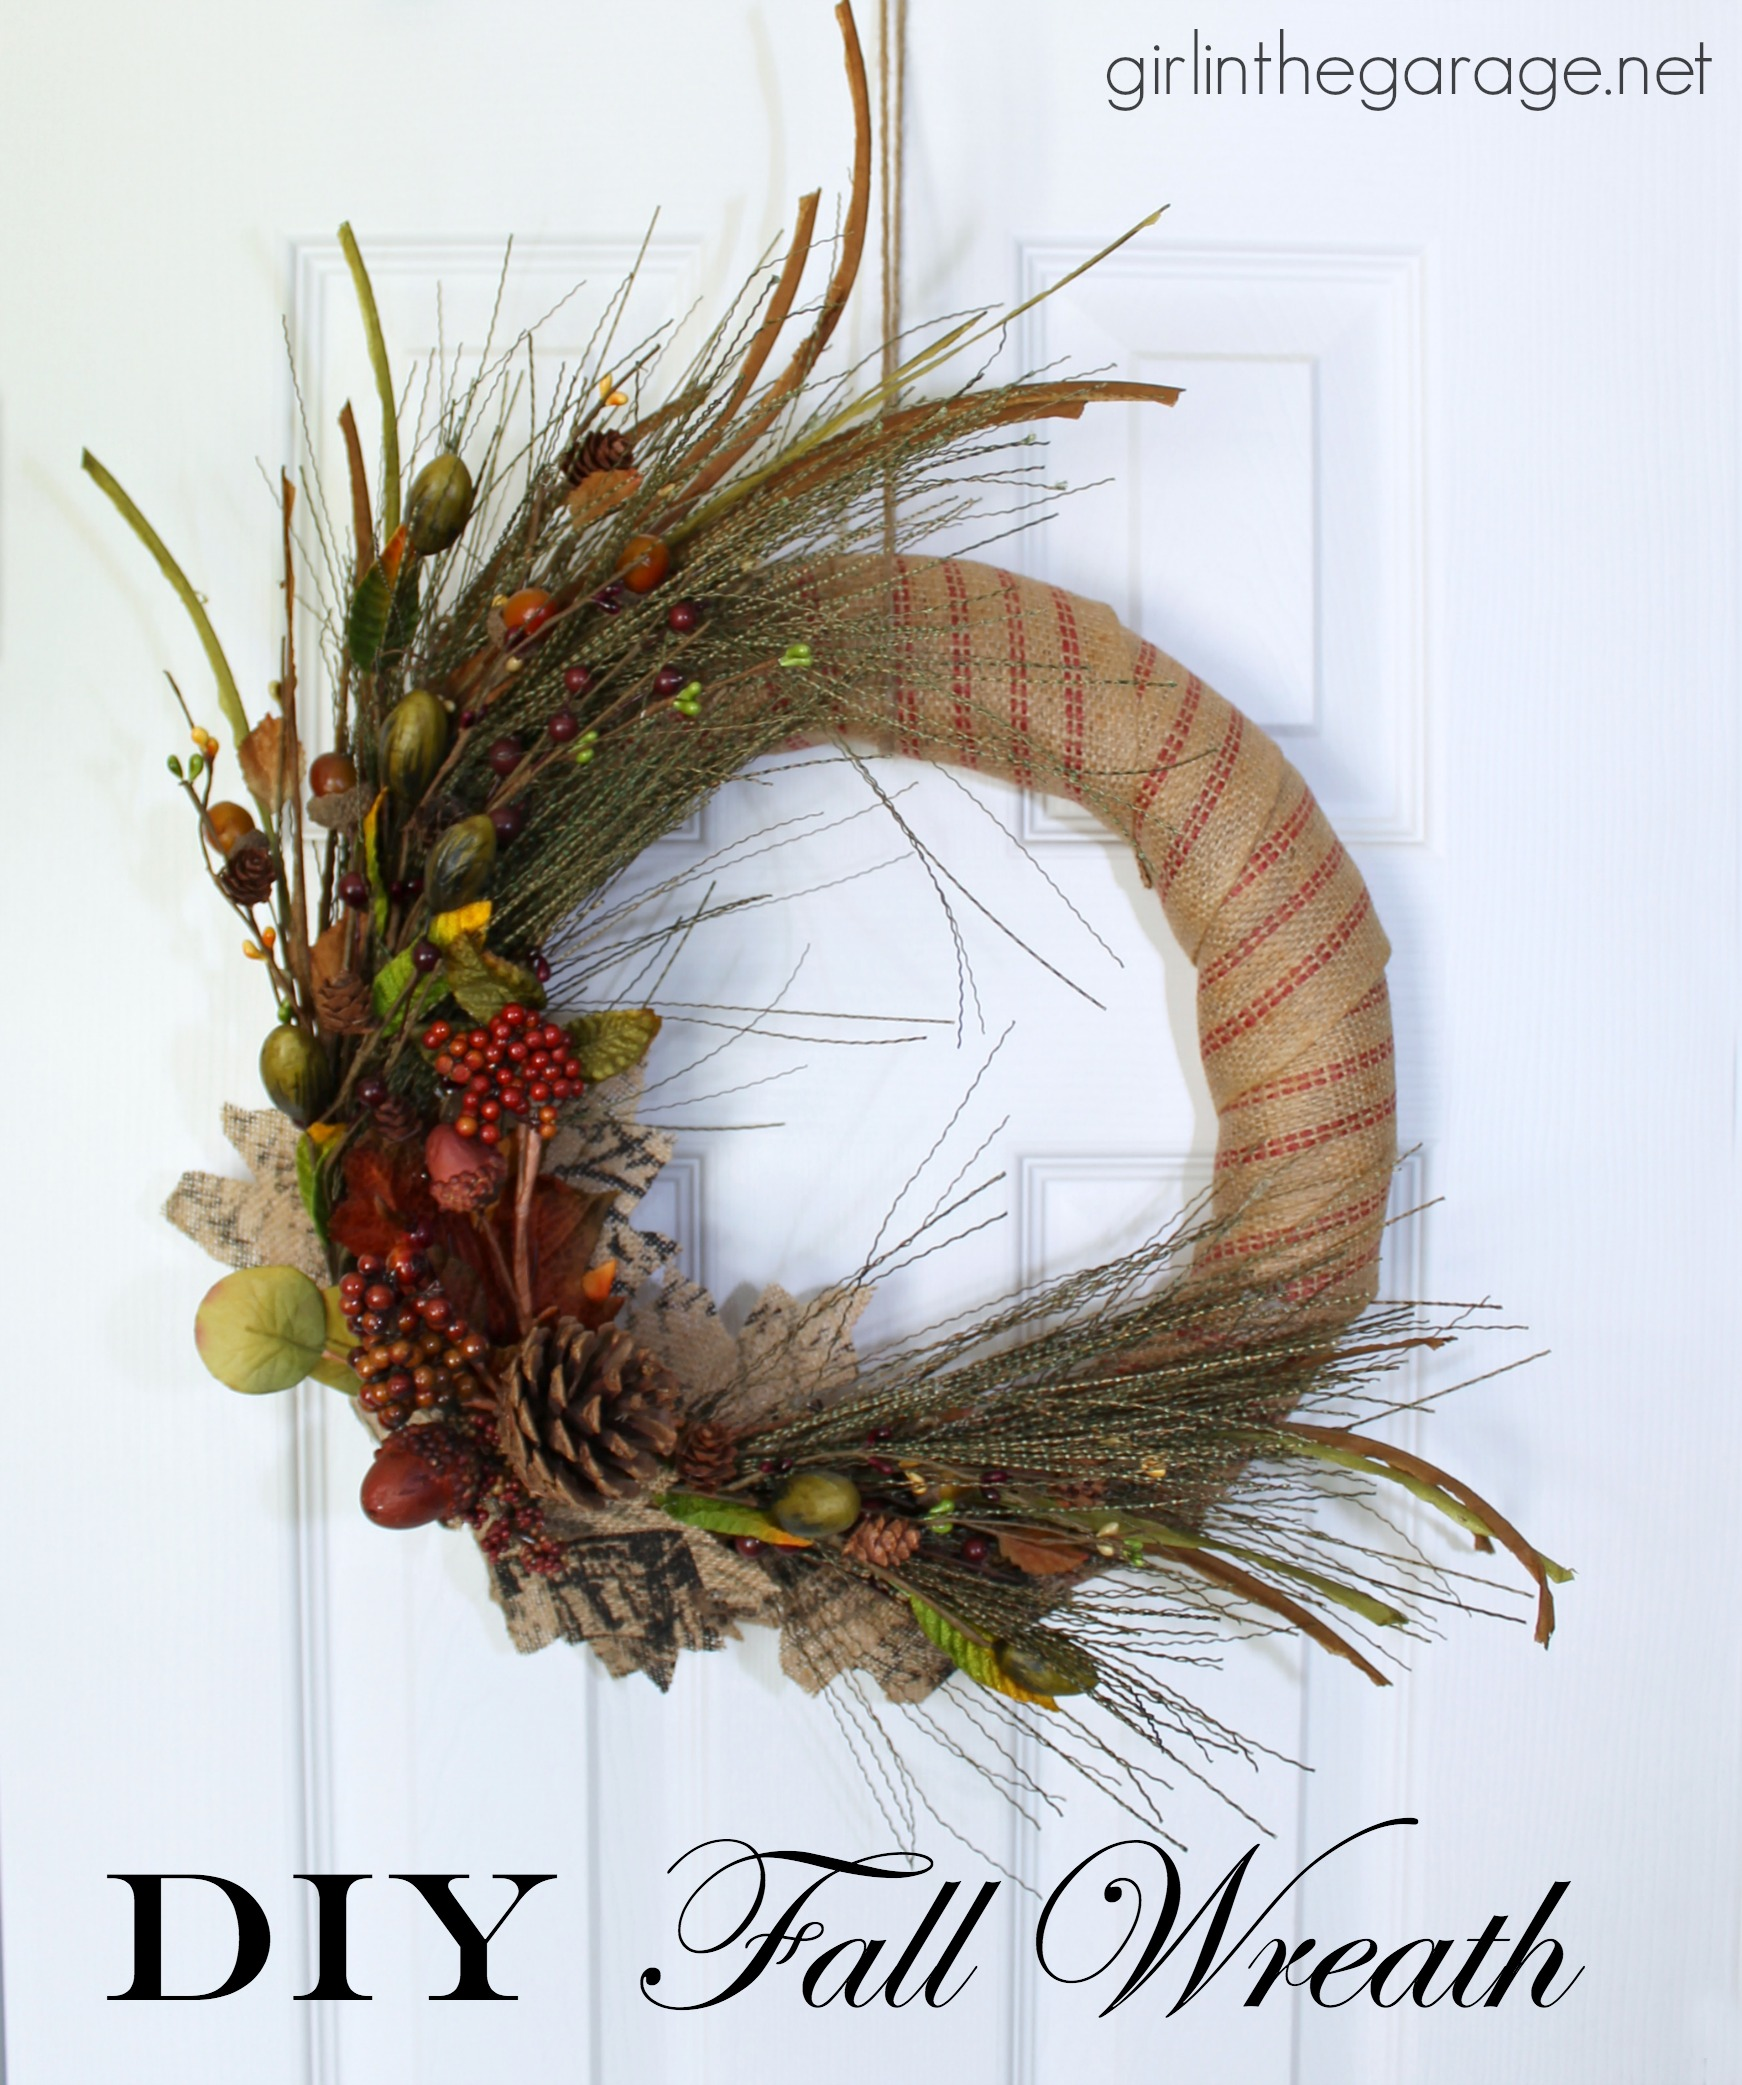 Fall Wreath Diy Fall Wreath Girl In The Garagear